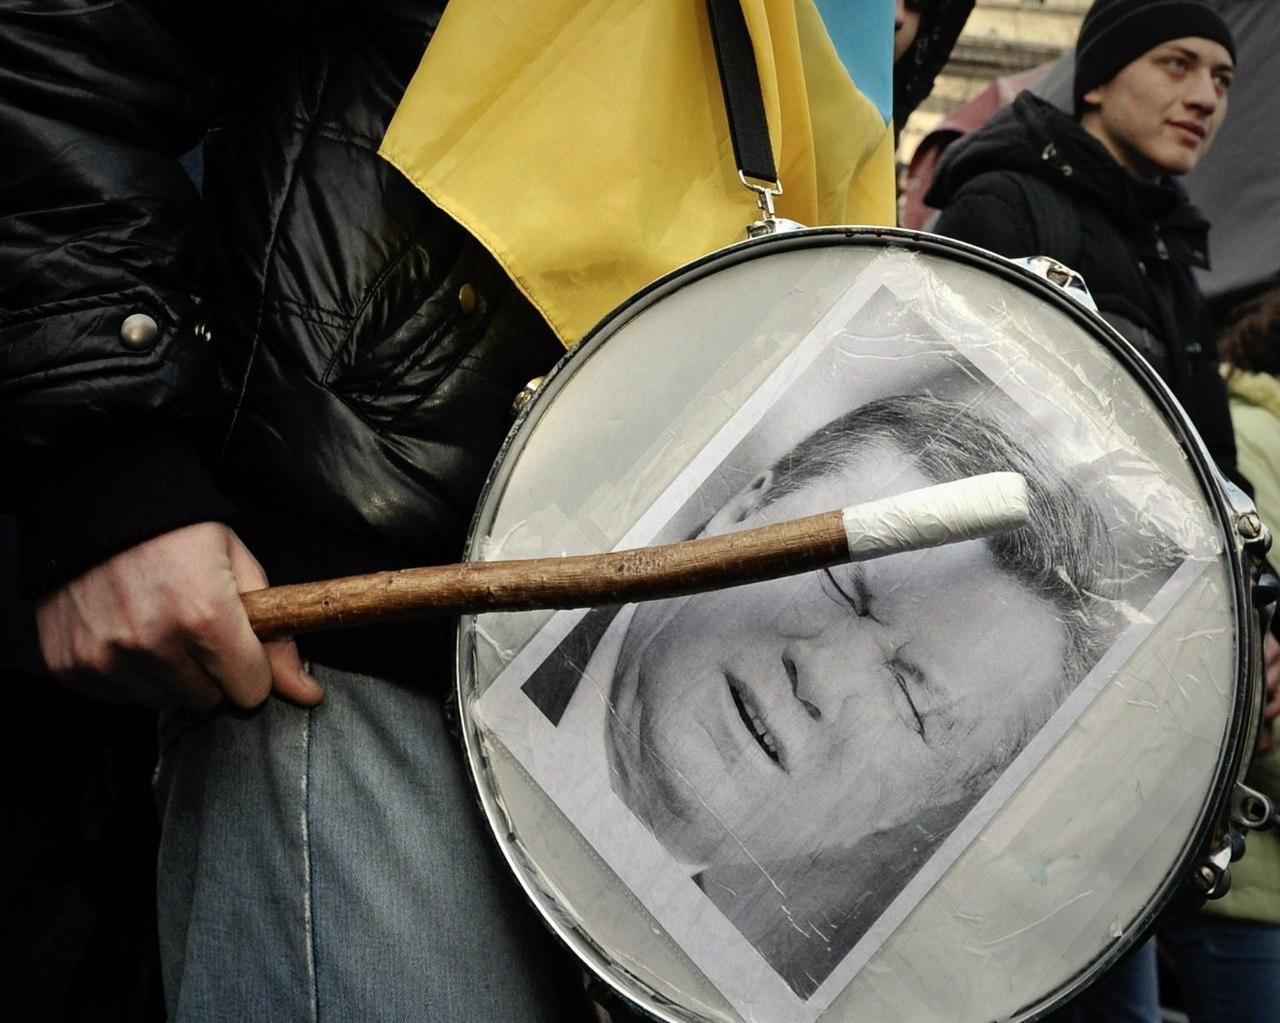 2O5SpfAgGeQ Евромайдан и люди (фото+видео)